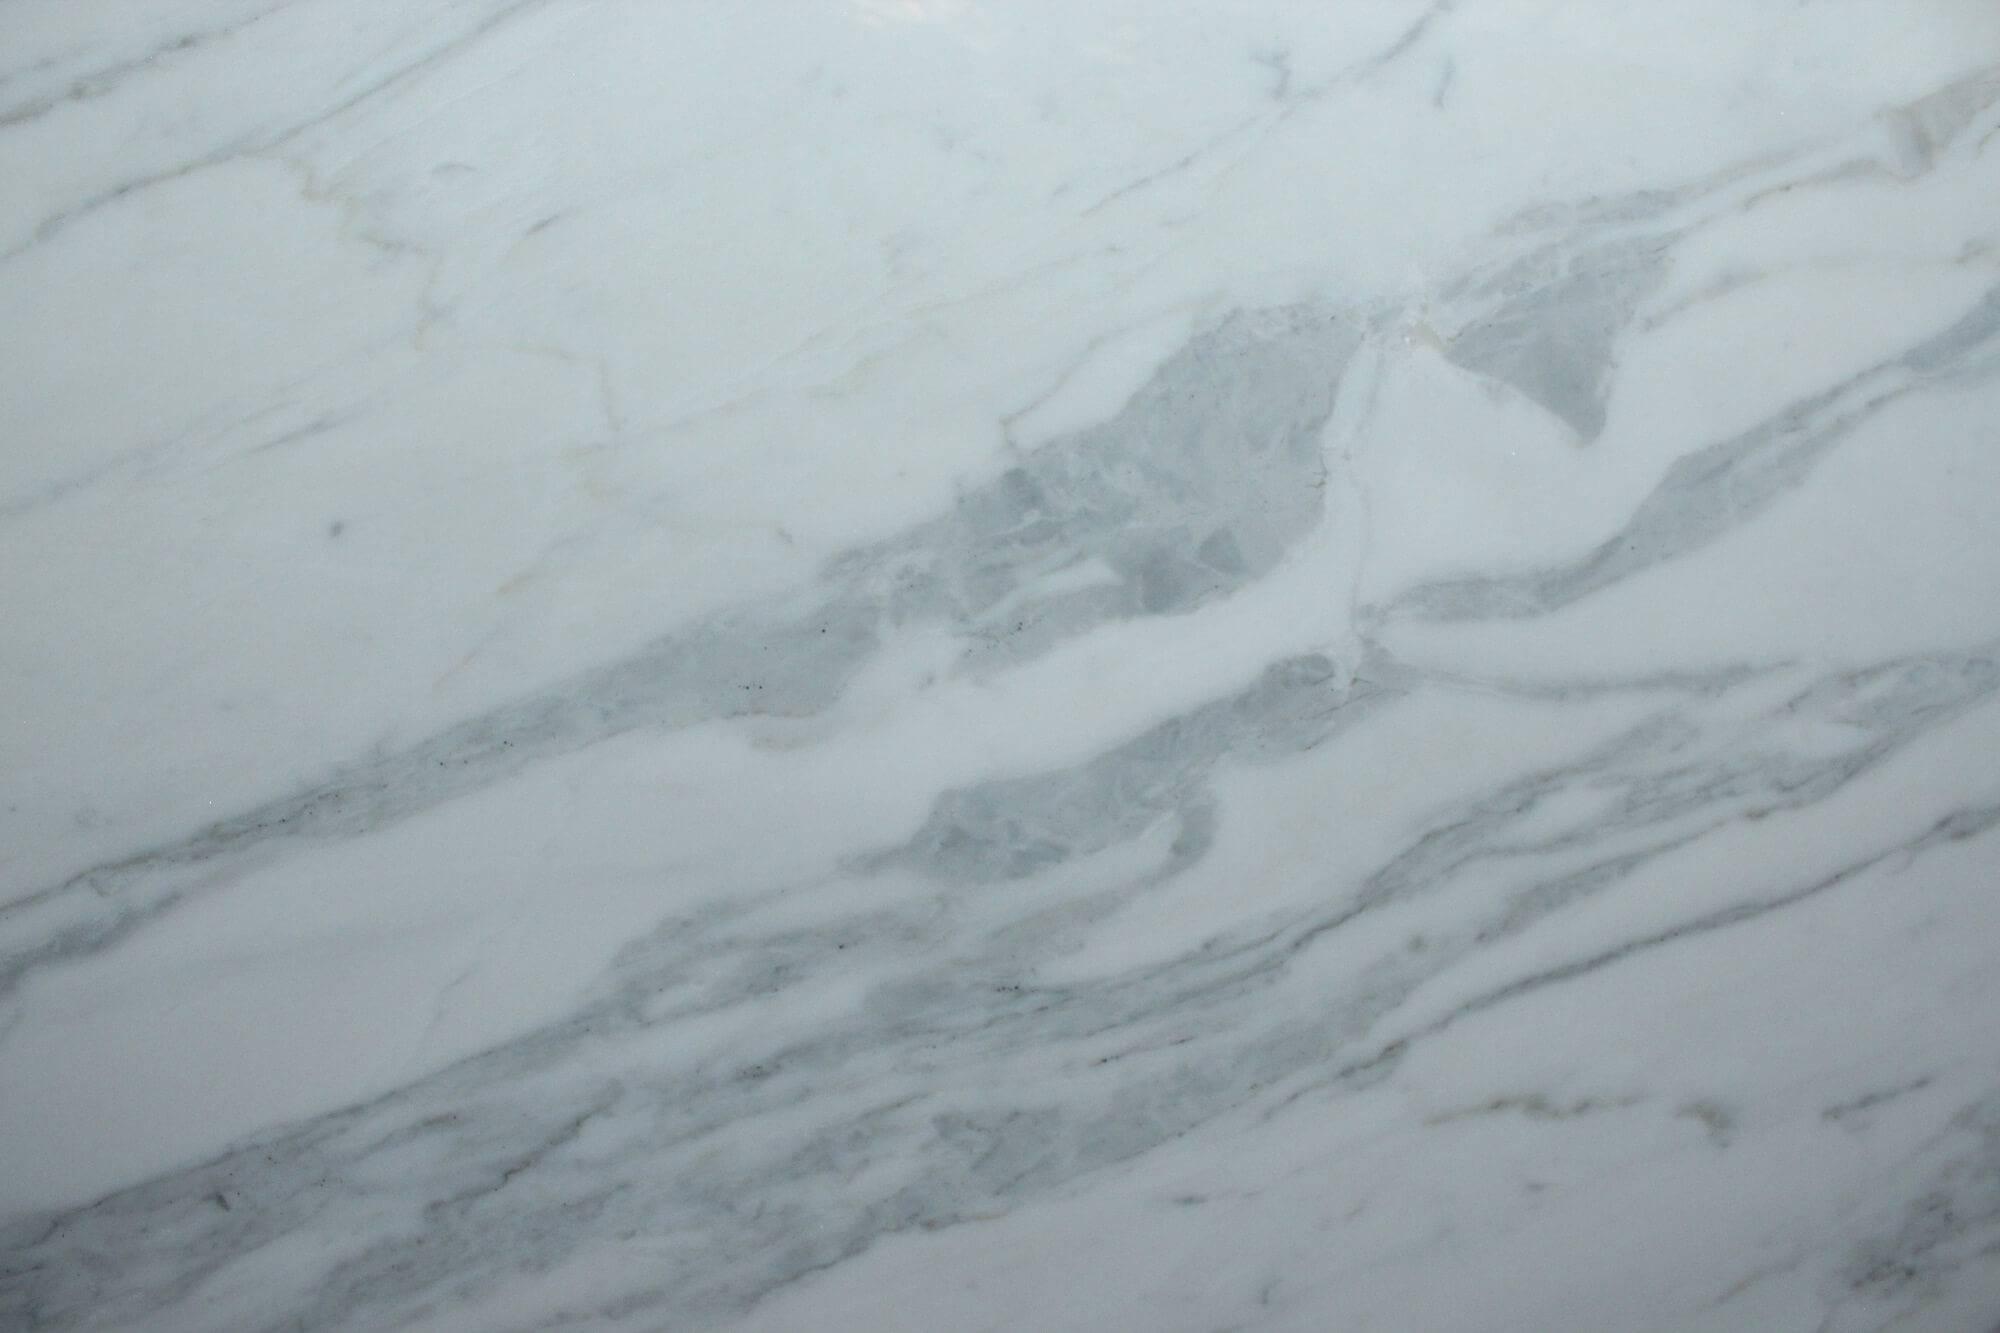 Calacatta фото 1 — камень от Bevers Marmyr